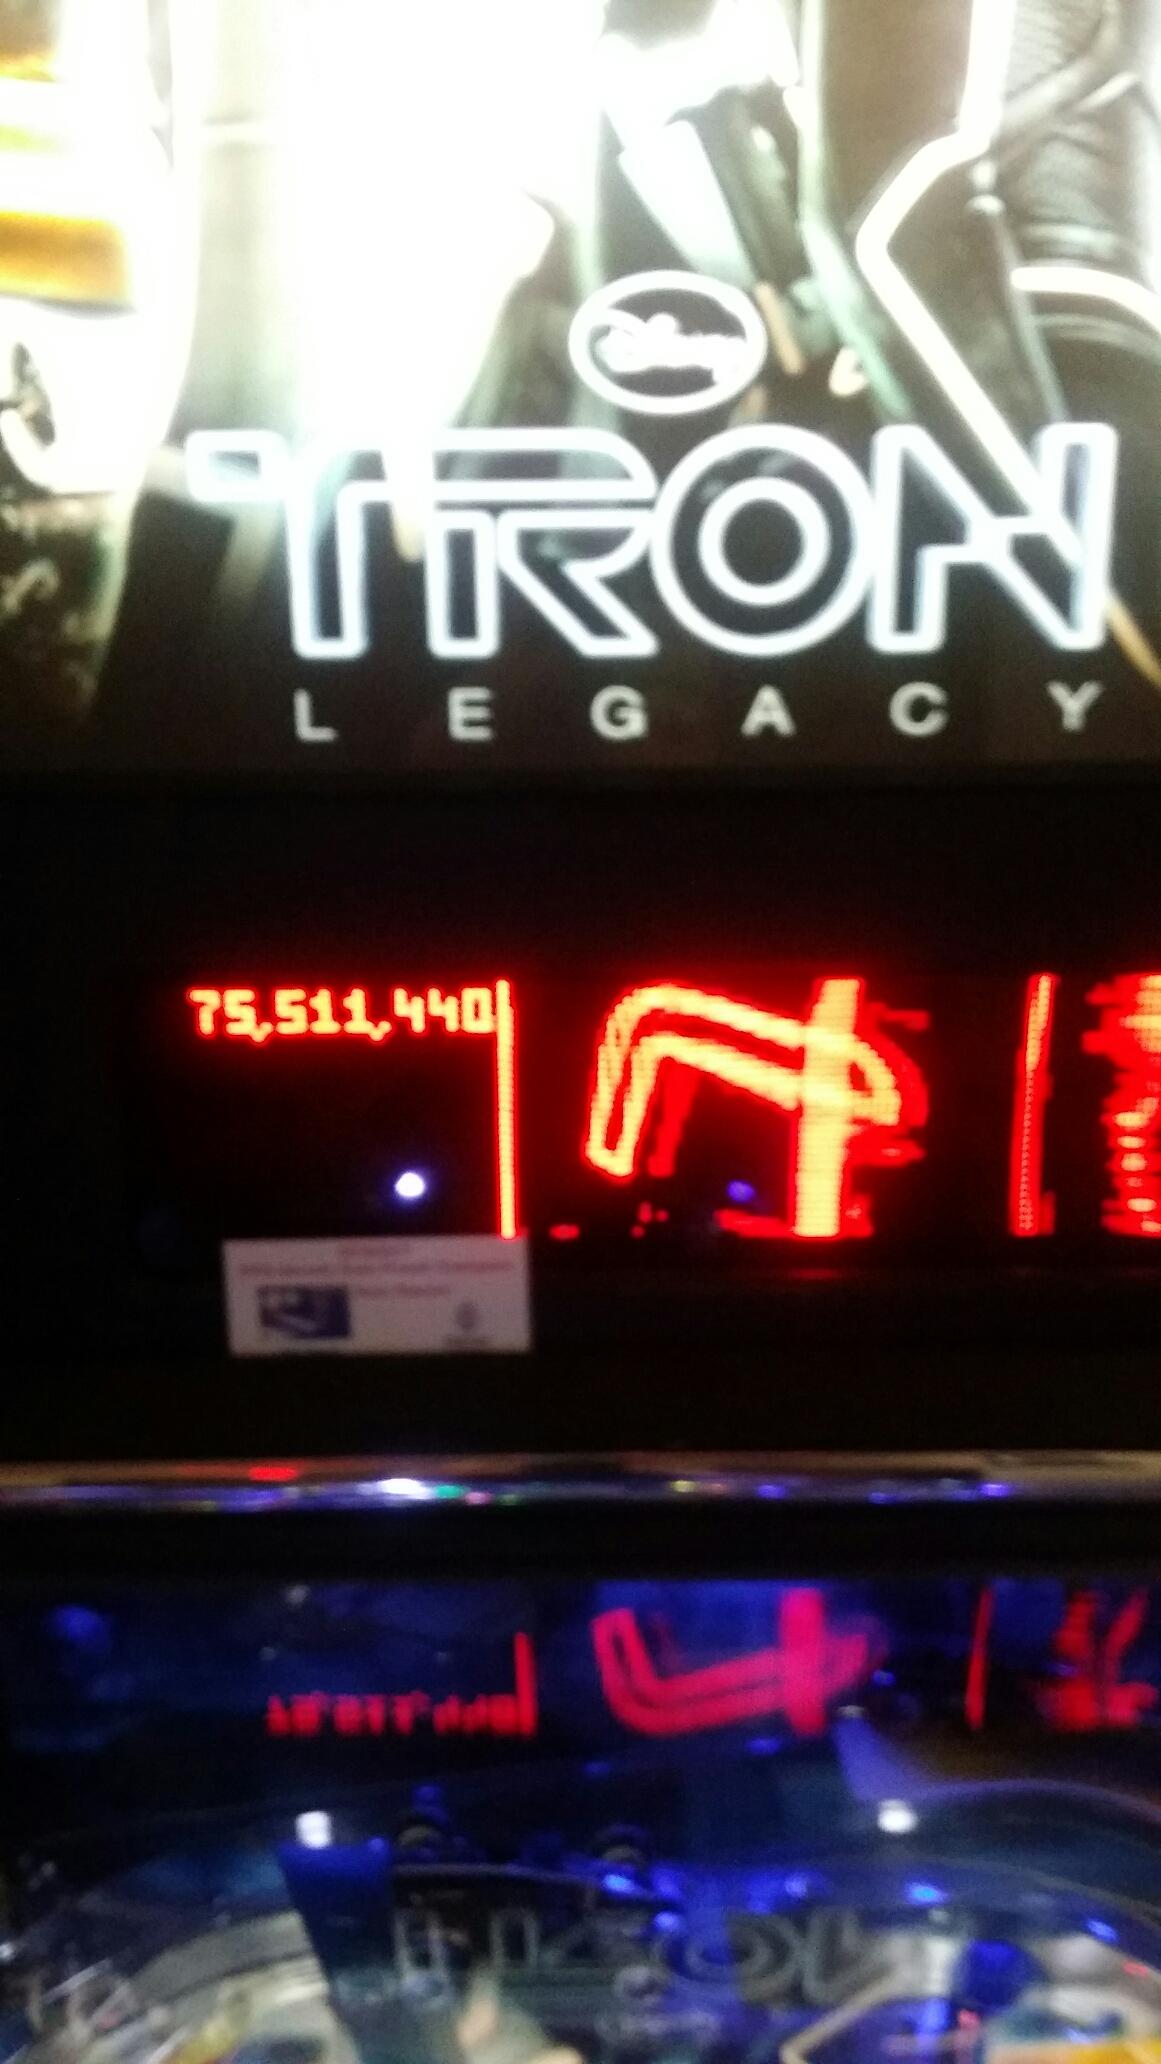 Tron 75,511,440 points